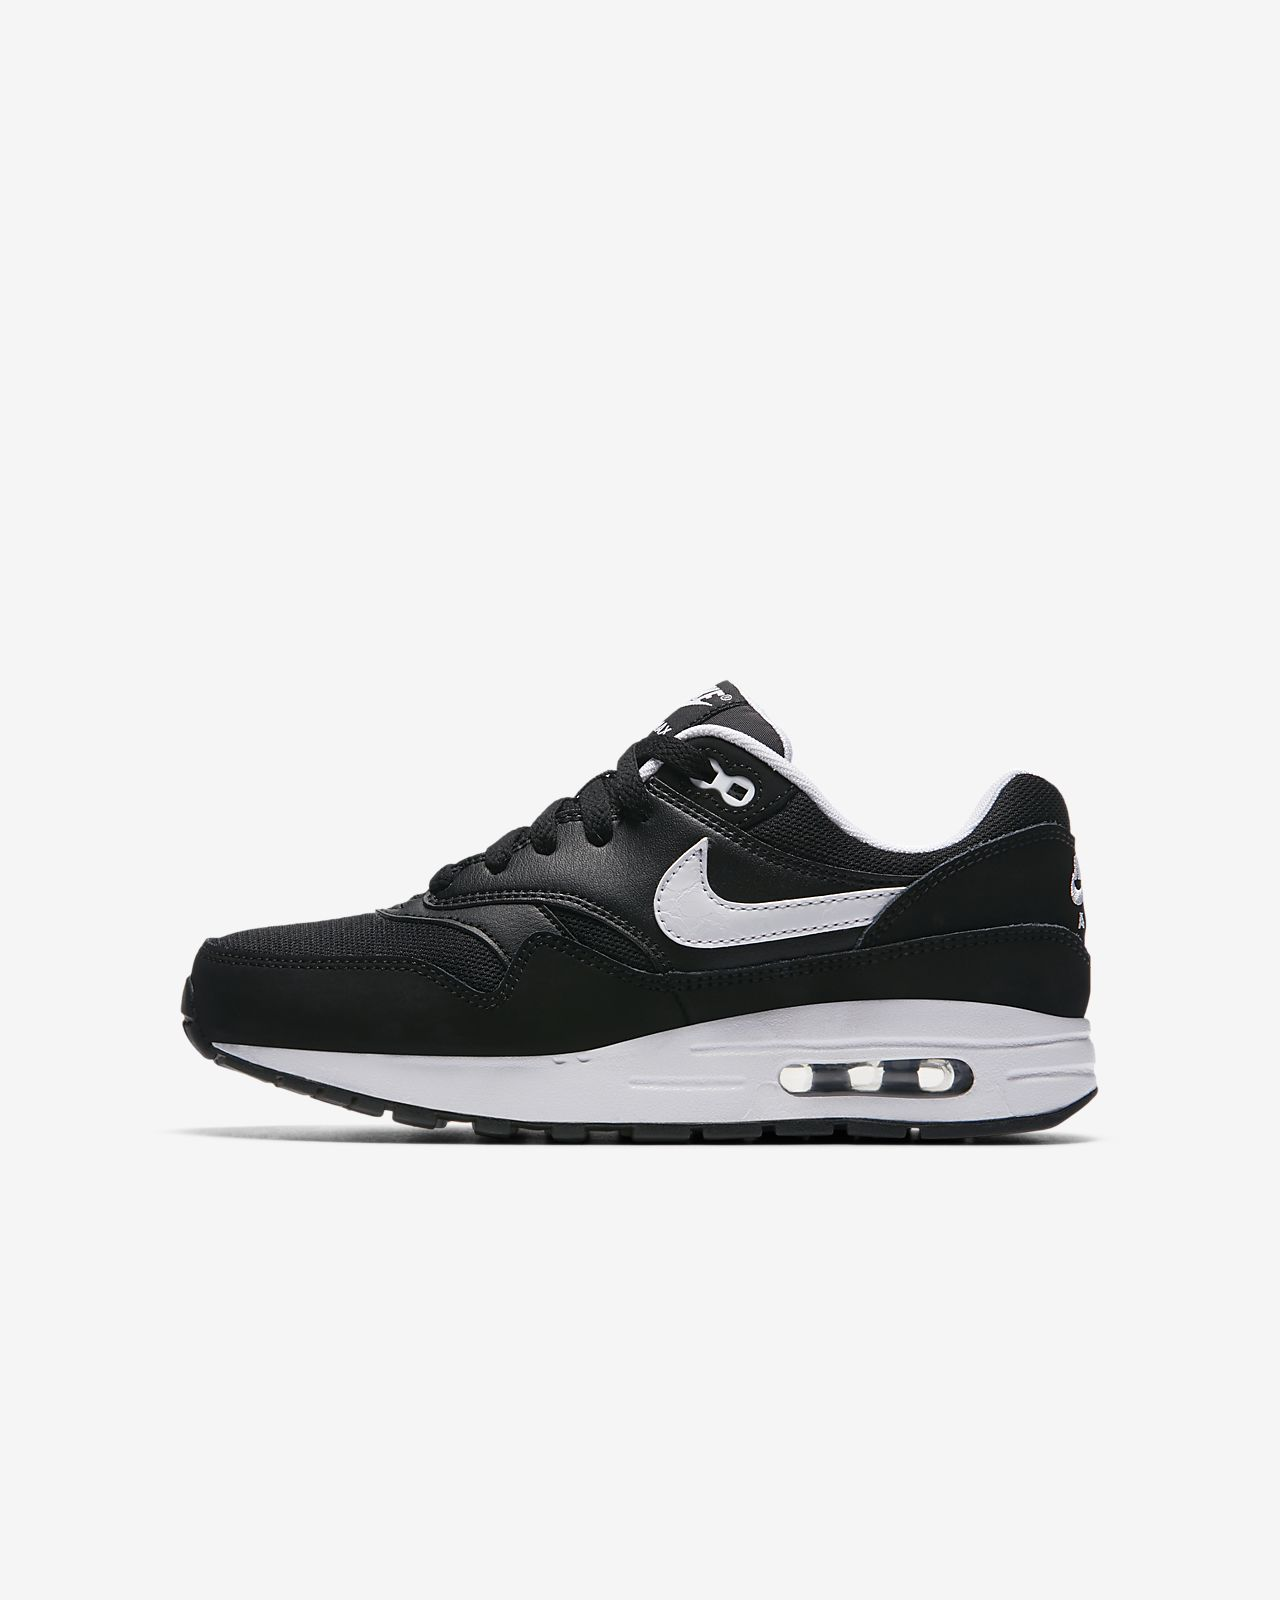 Buty dla dużych dzieci Nike Air Max 1